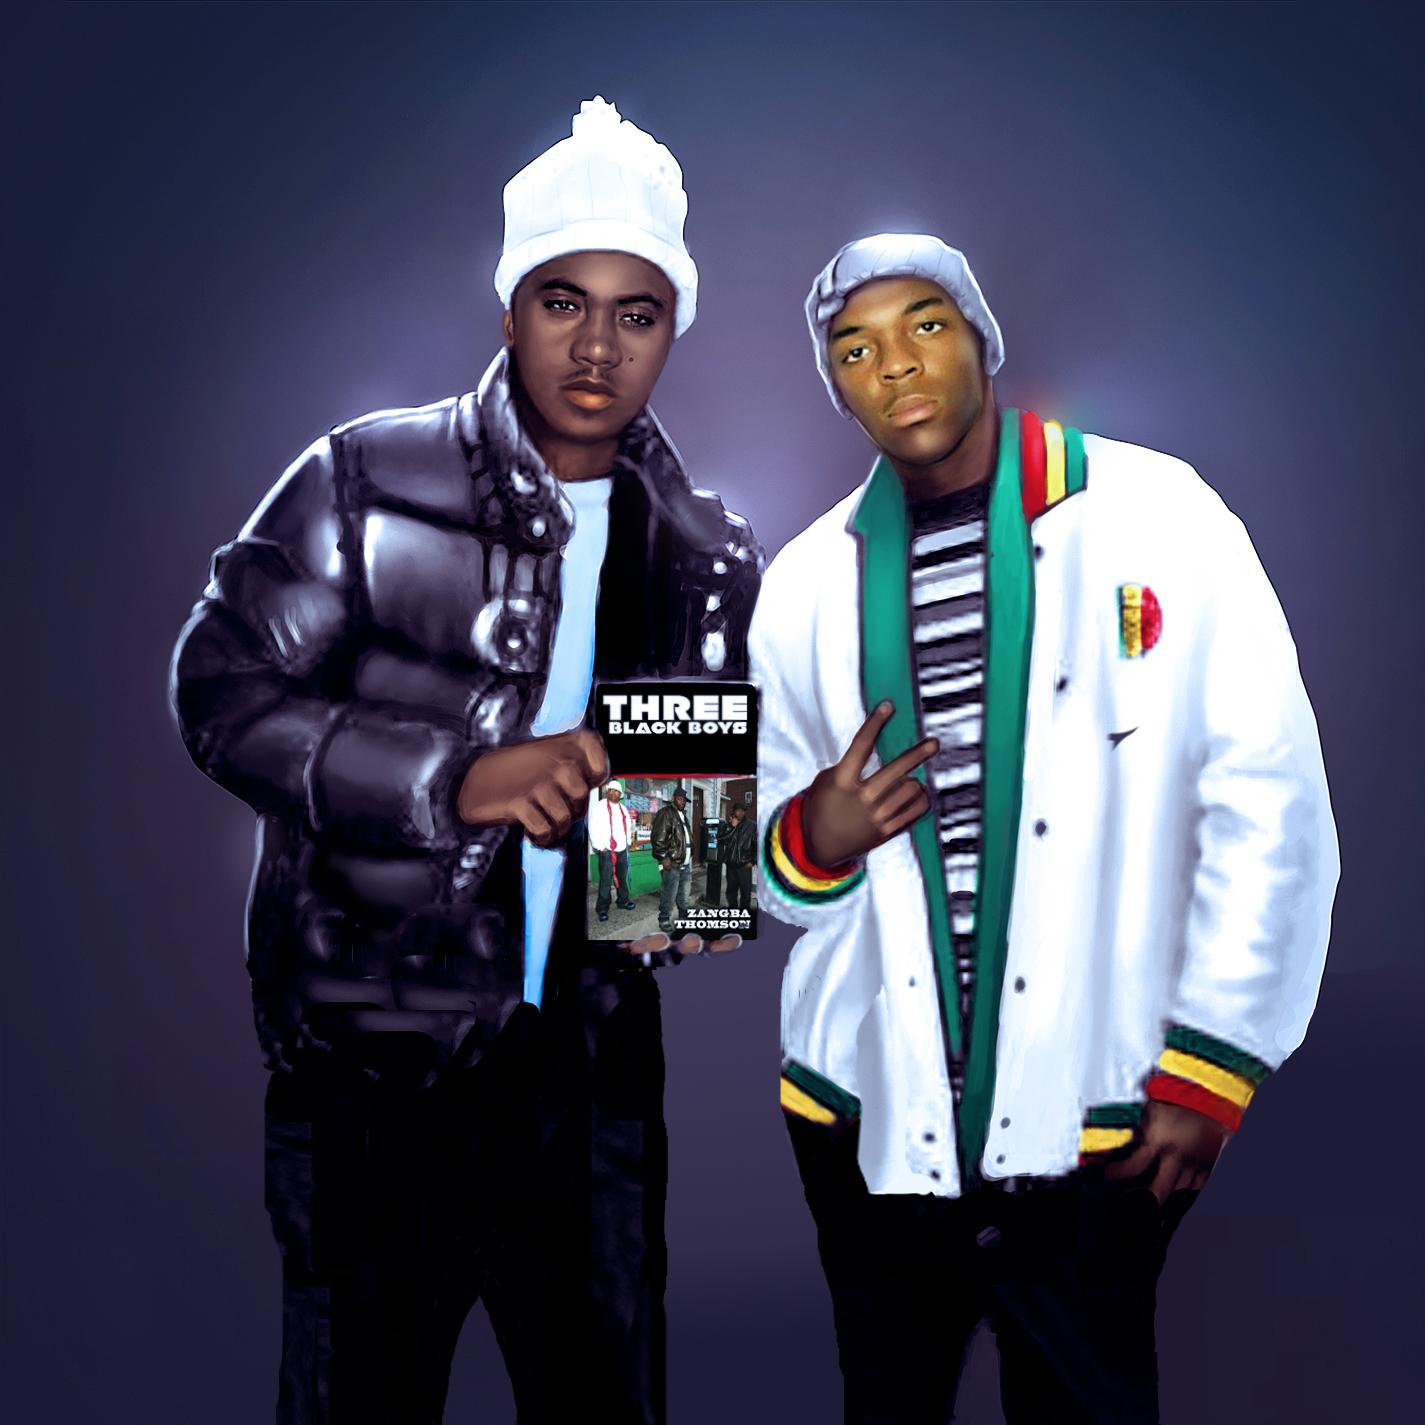 Zangba & Nas Three Black Boys portrait